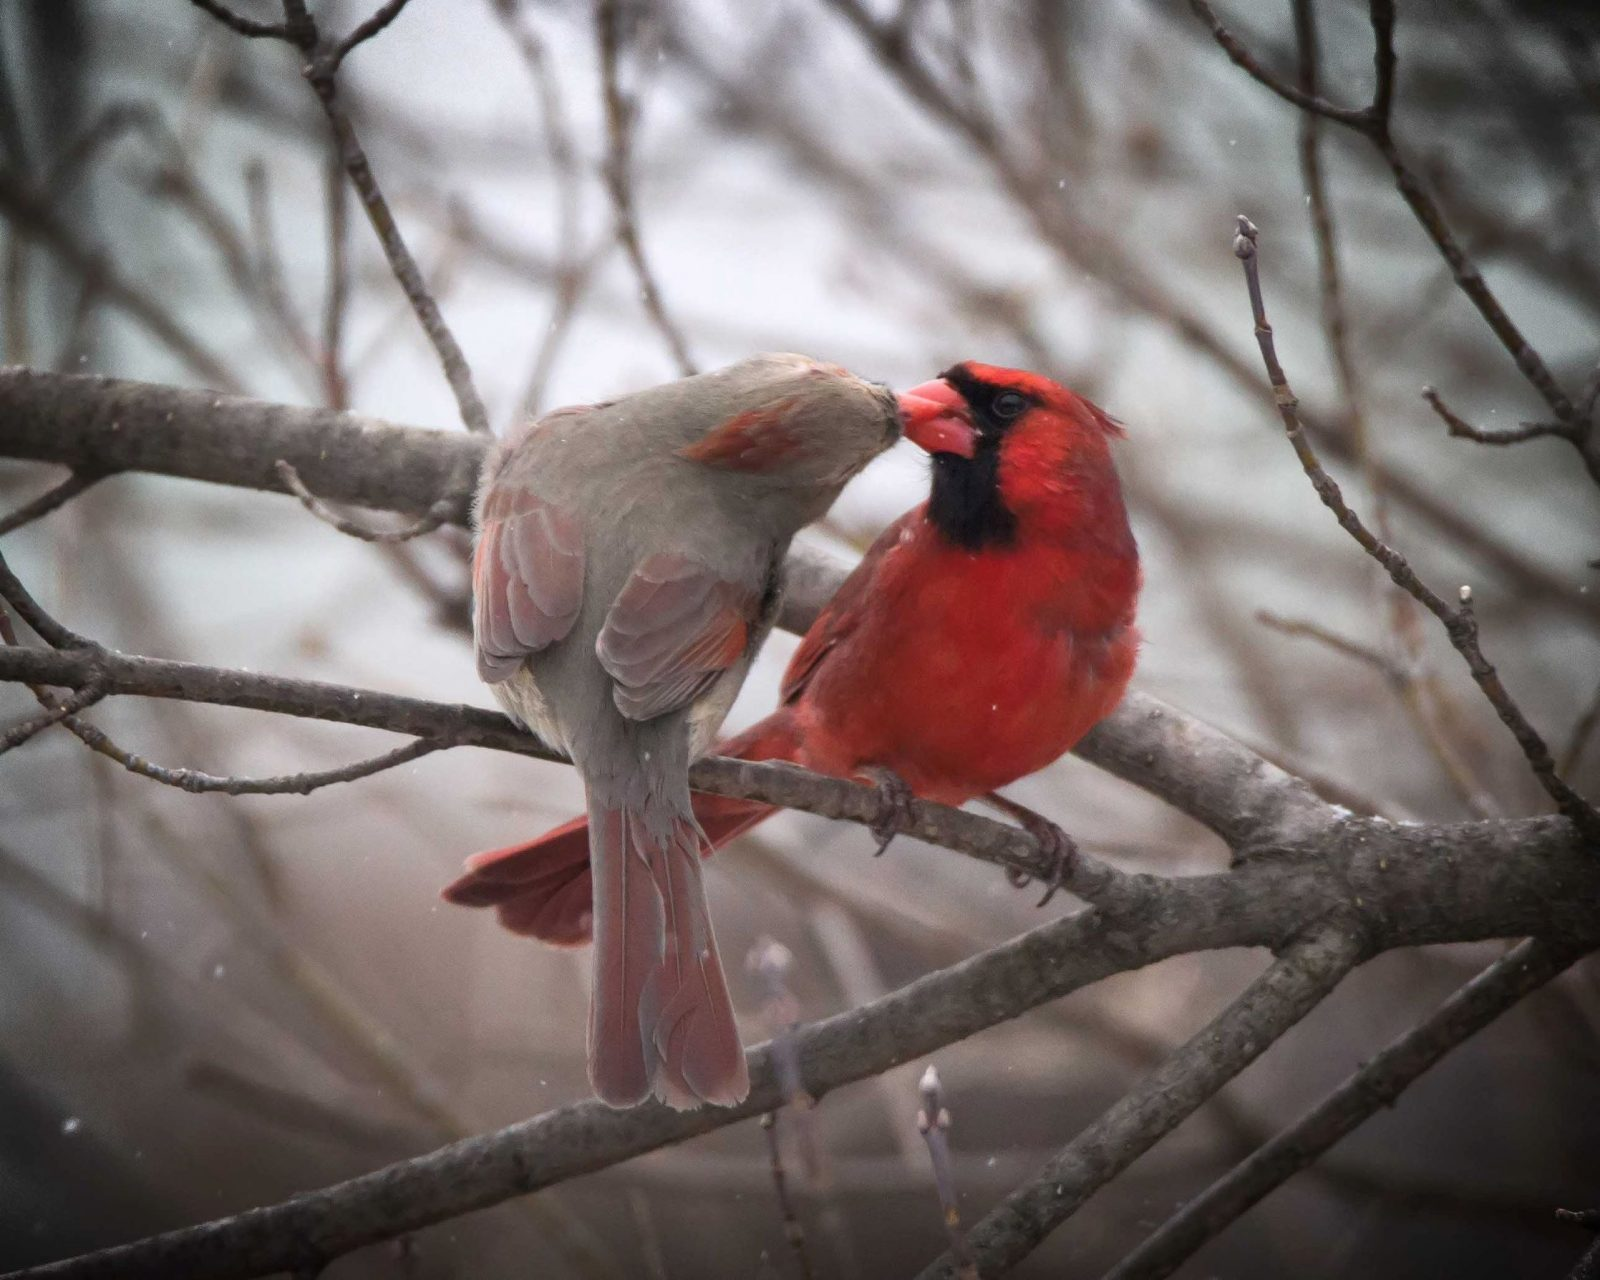 Loving cardinals